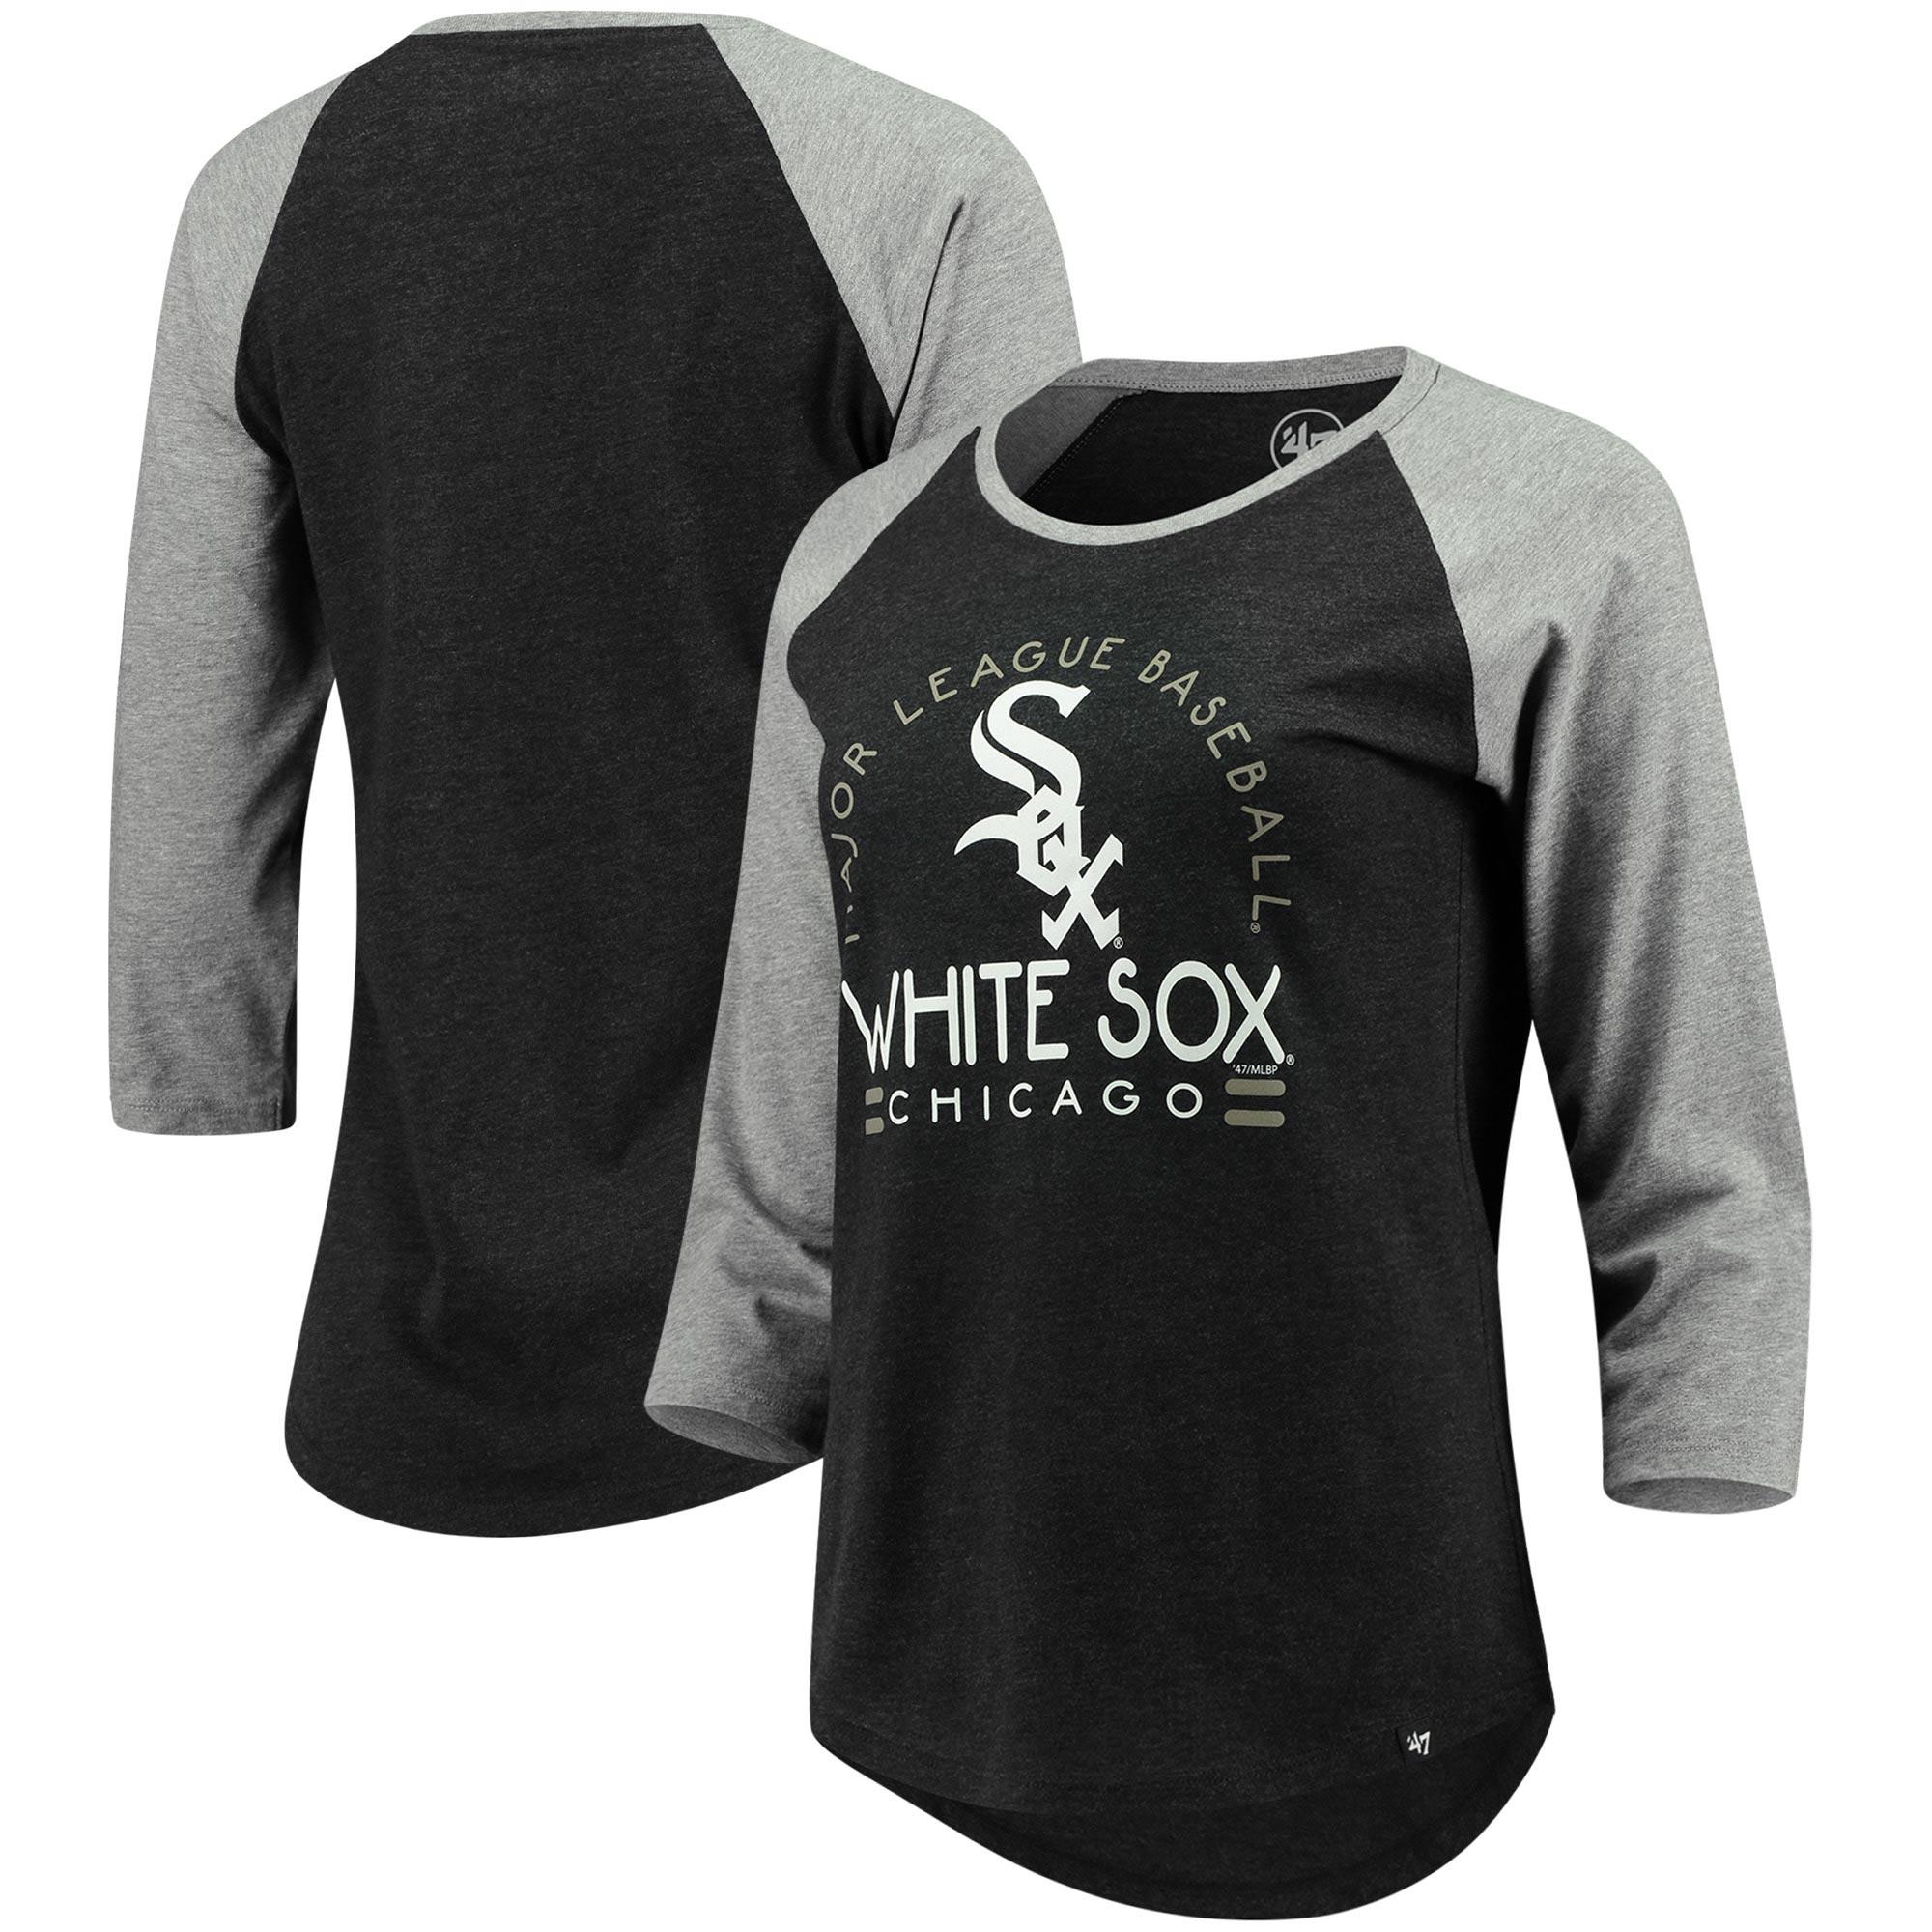 Chicago White Sox '47 Women's Club 3/4-Sleeve Raglan T-Shirt - Heathered Black